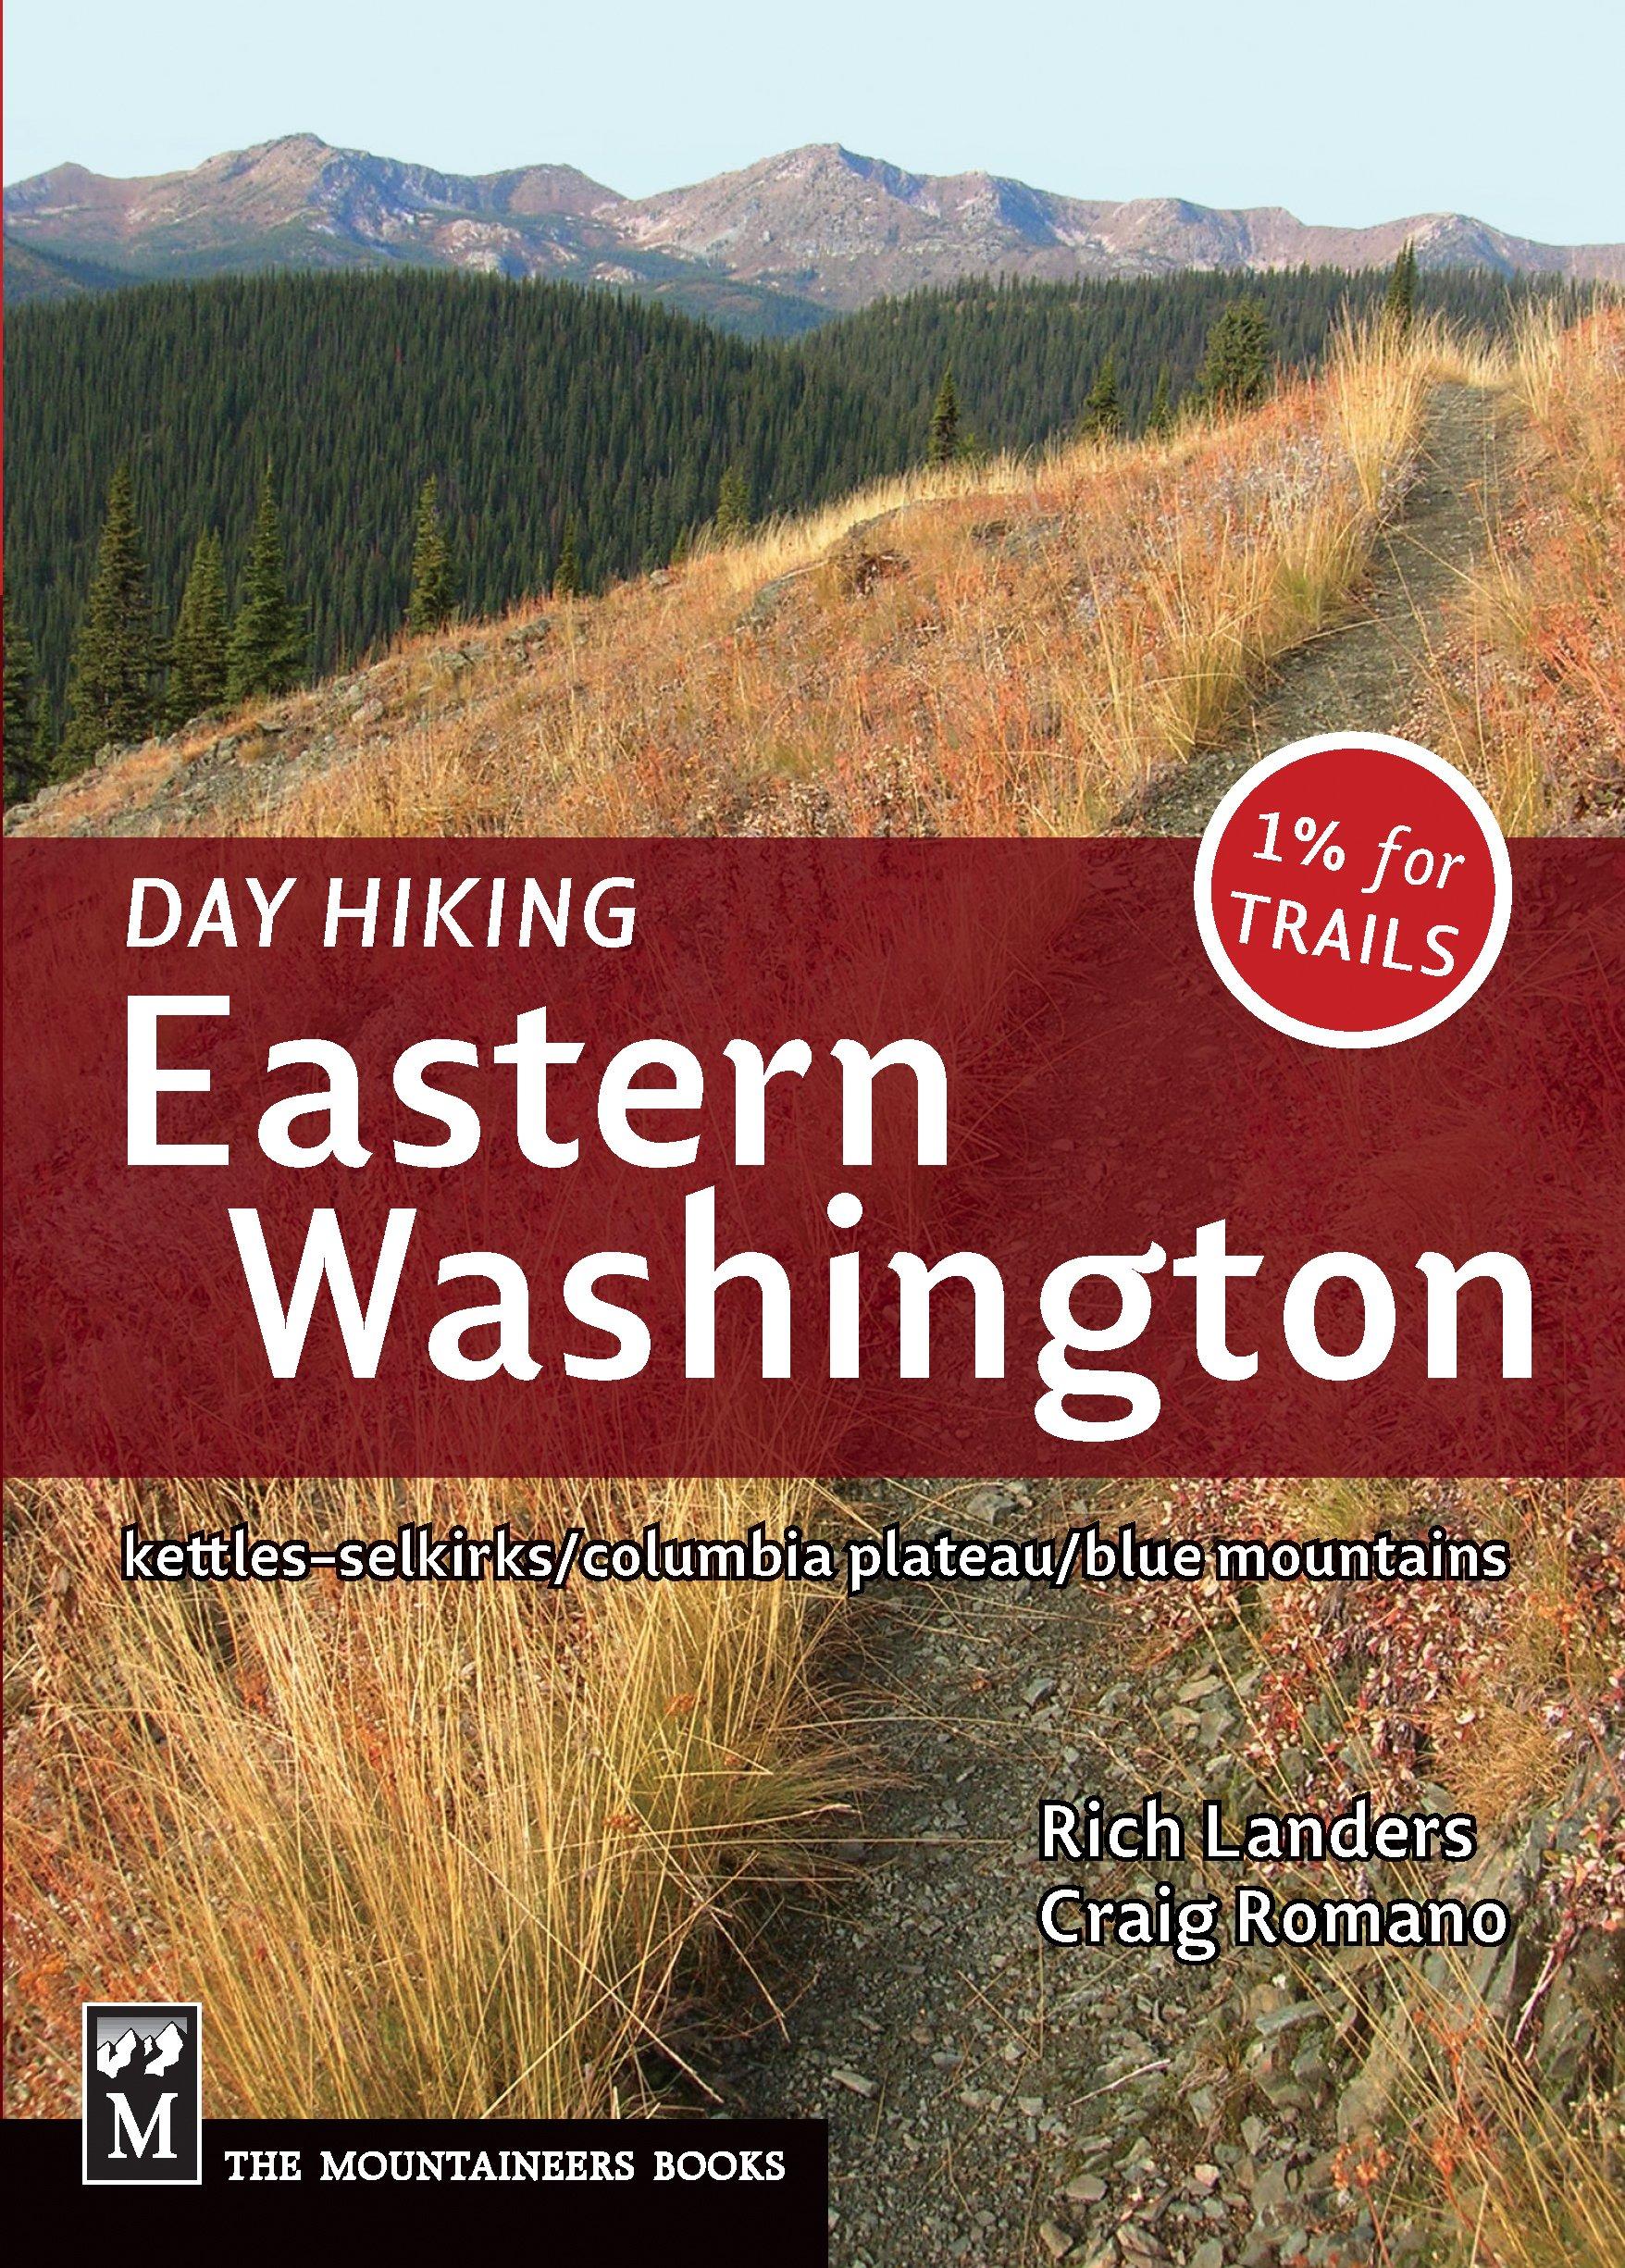 Download Day Hiking: Eastern Washington: Kettles-Selkirks * Columbia Plateau * Blue Mountains PDF